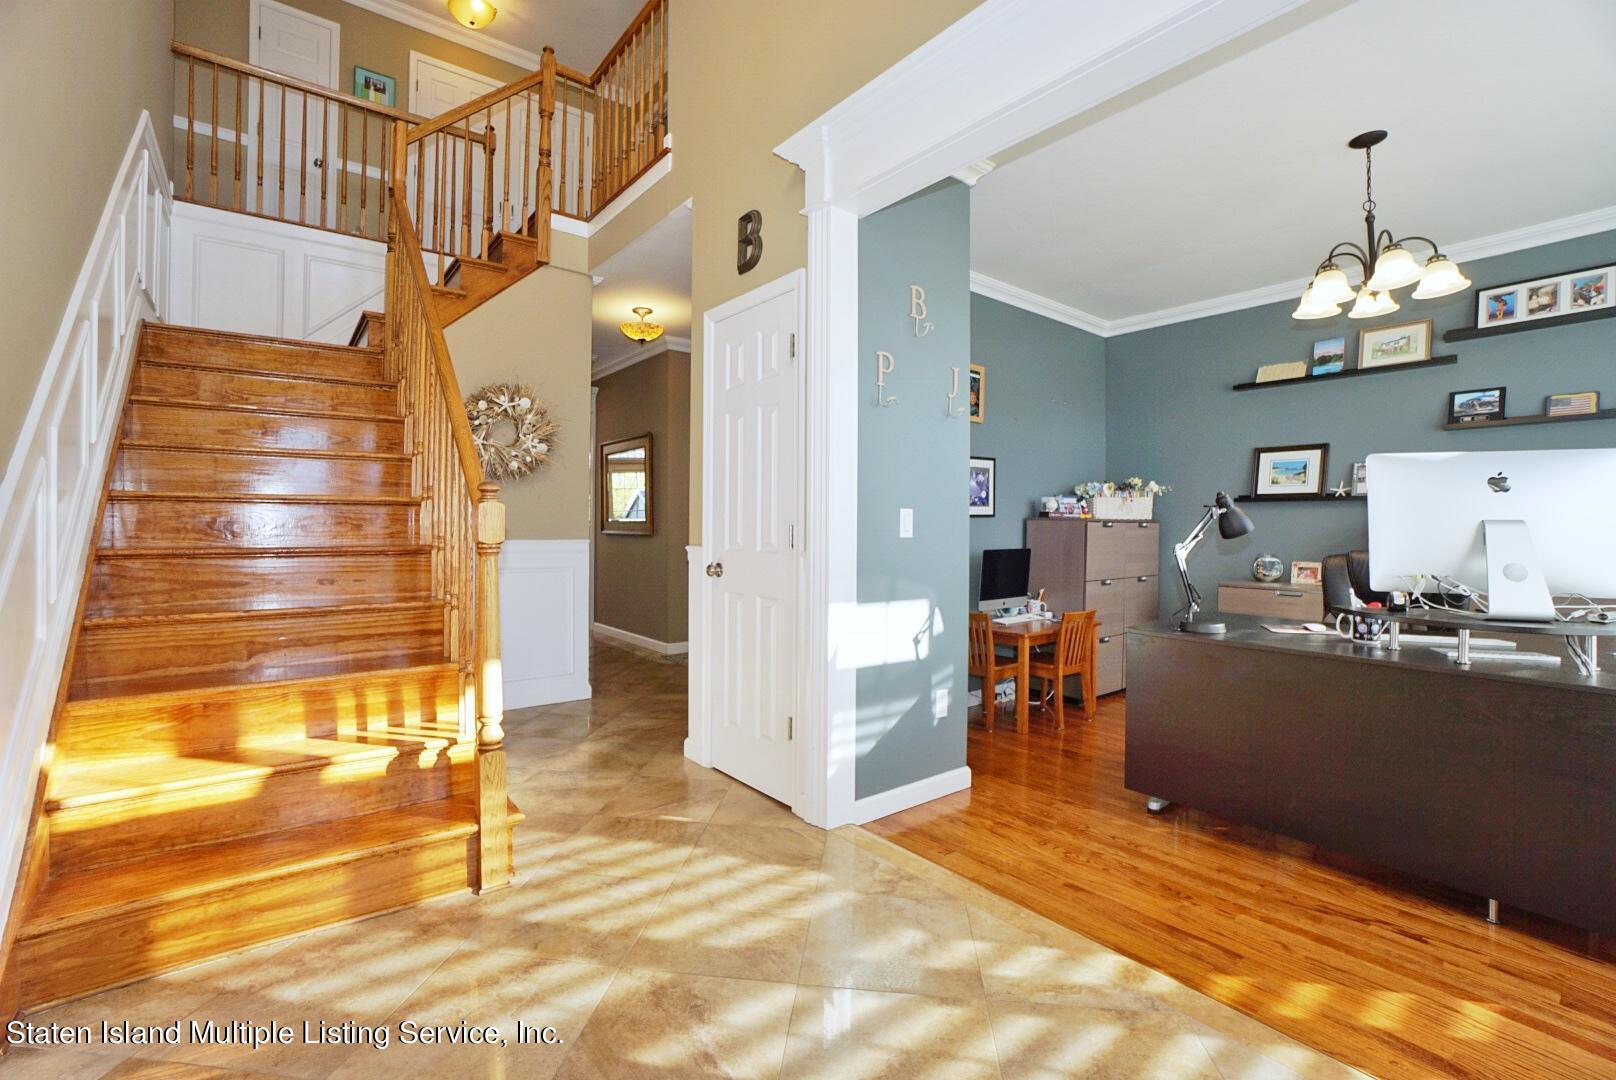 Single Family - Detached 31 Belwood Loop  Staten Island, NY 10307, MLS-1143133-8